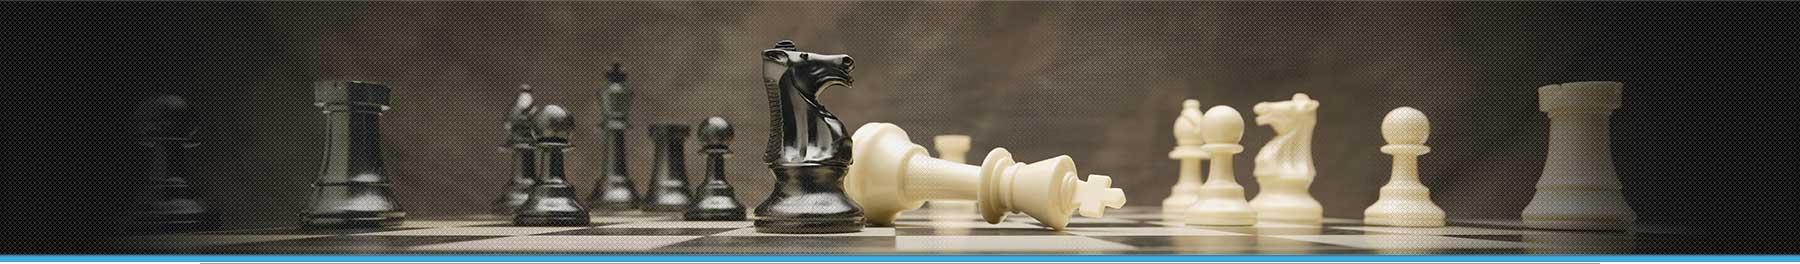 Chess image